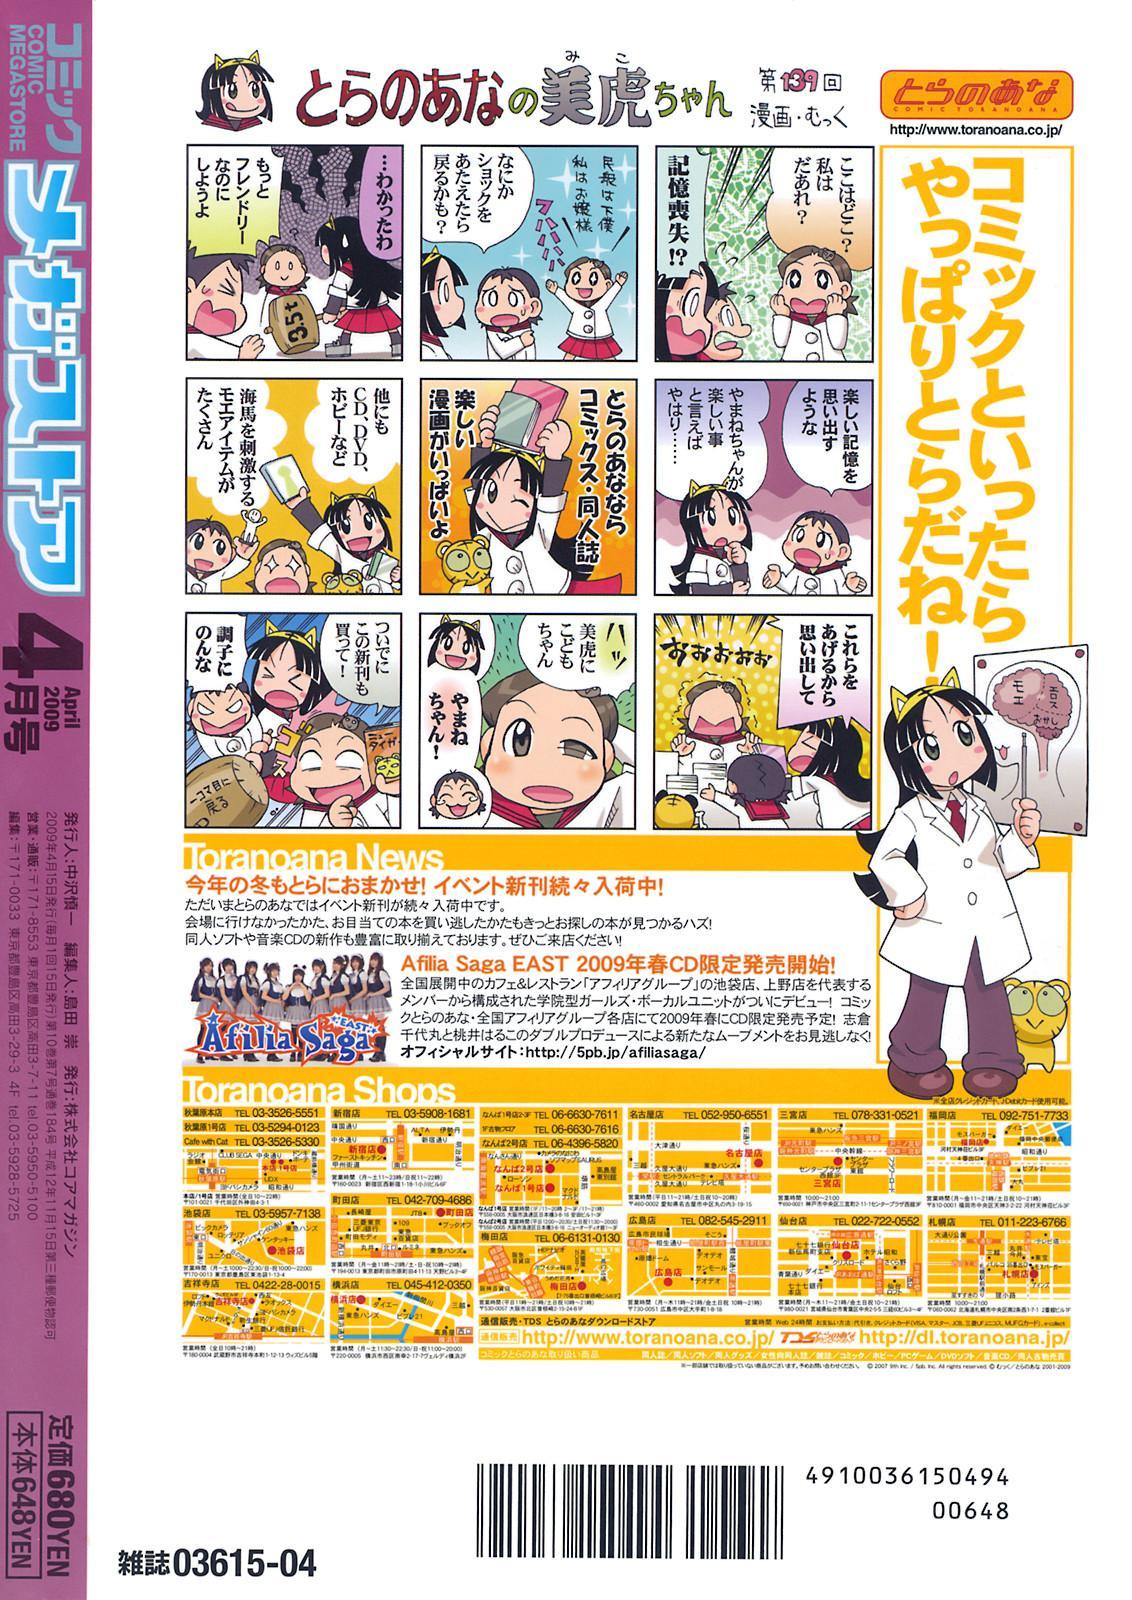 COMIC Megastore 2009-04 528